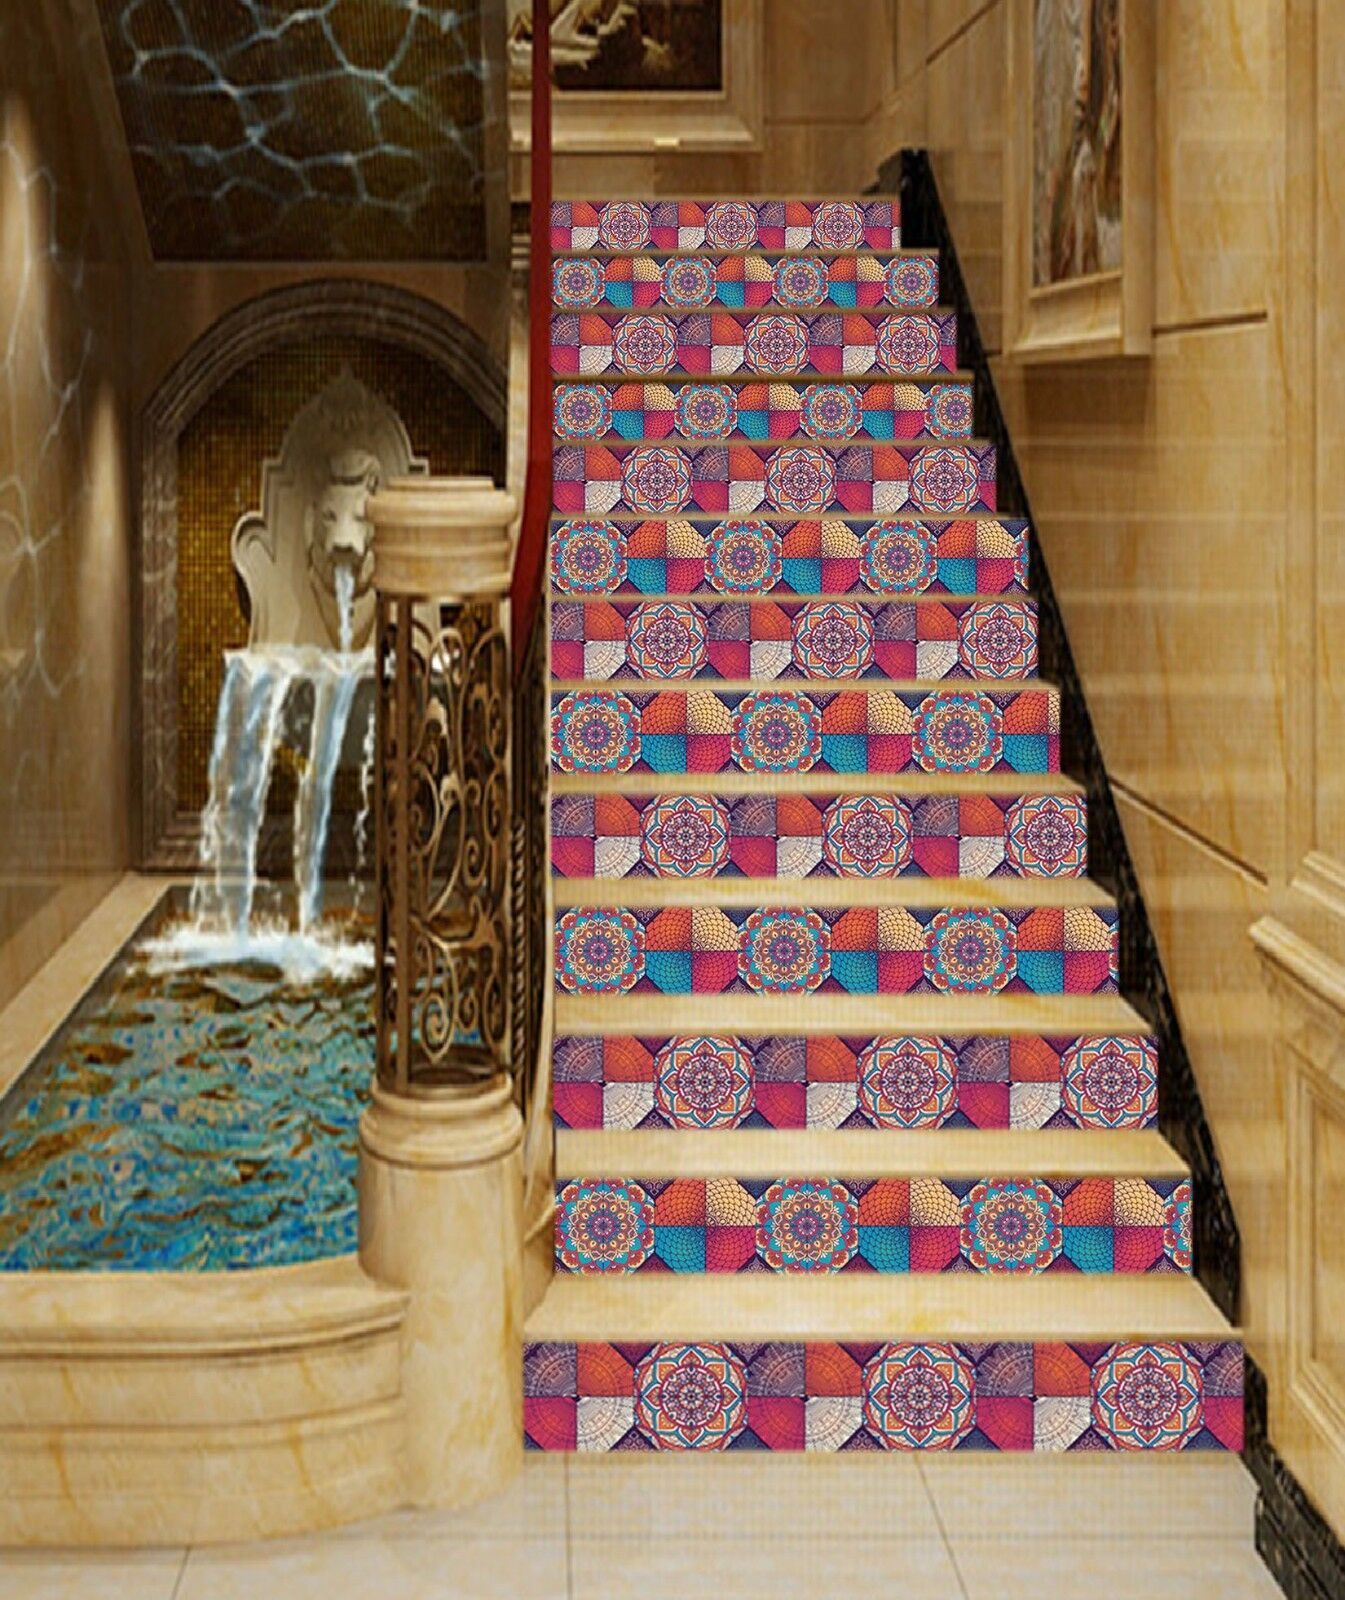 3D color Flower 307 Stair Risers Decoration Photo Mural Vinyl Decal Wallpaper UK